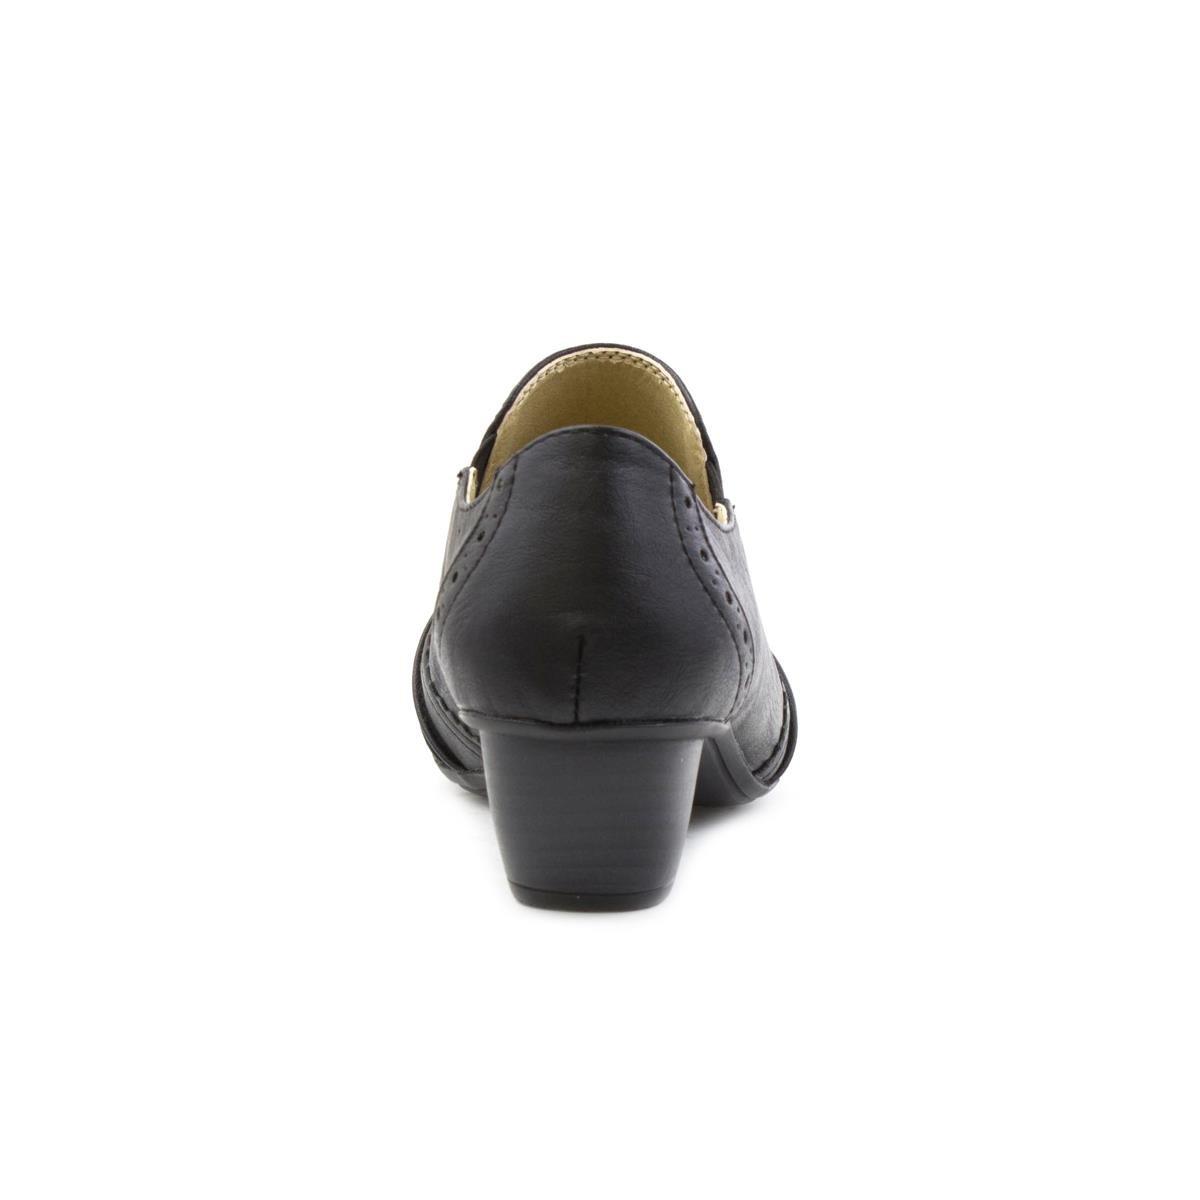 ed73aea4c98 Lilley & Skinner Womens Black Heeled Brogue Shoe